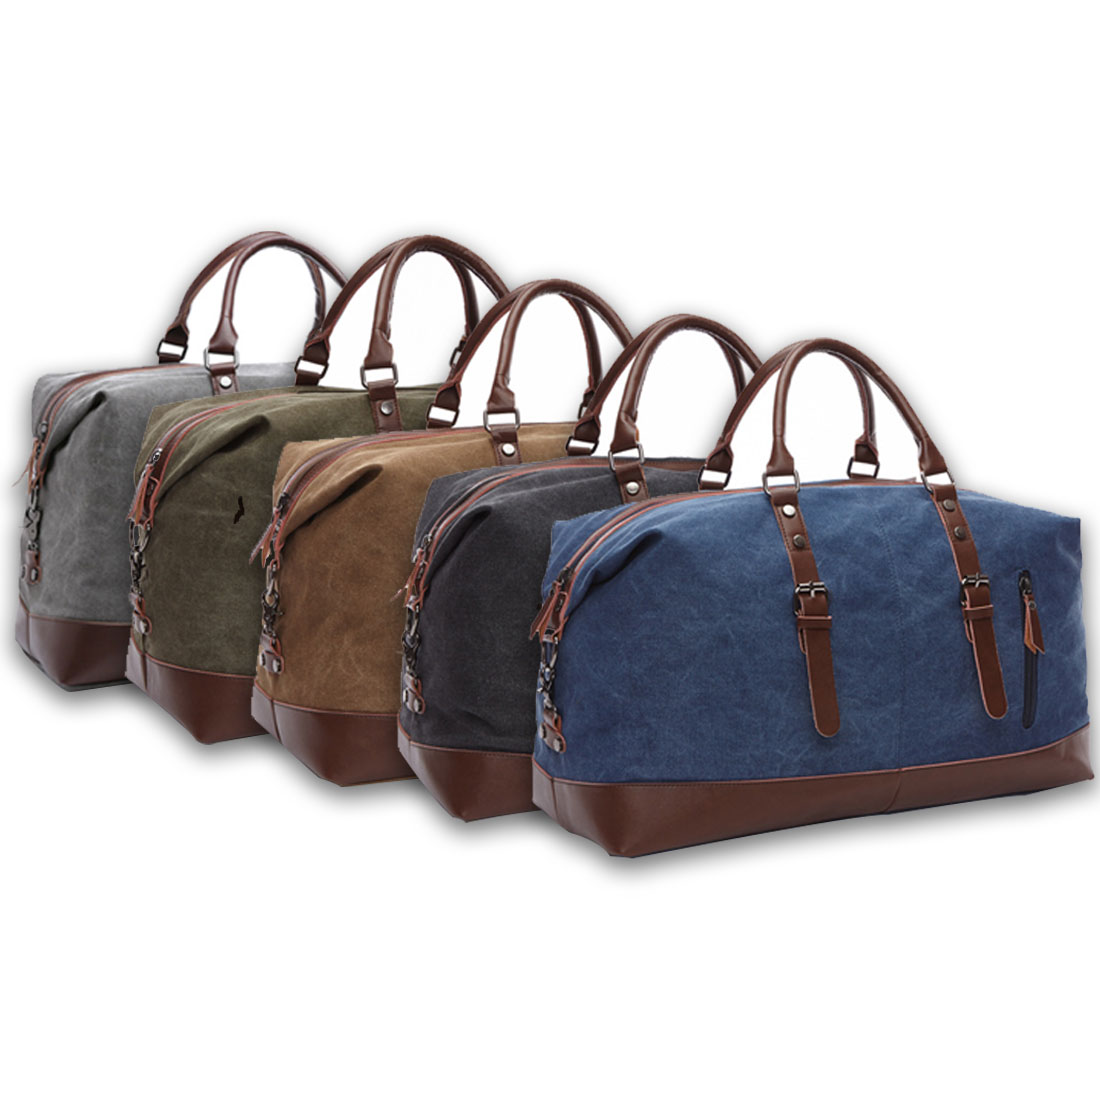 Canvas Leather Men Travel Bags Carry On Luggage Bag Men Bags Handbag Travel Tote Large Weekend Bag